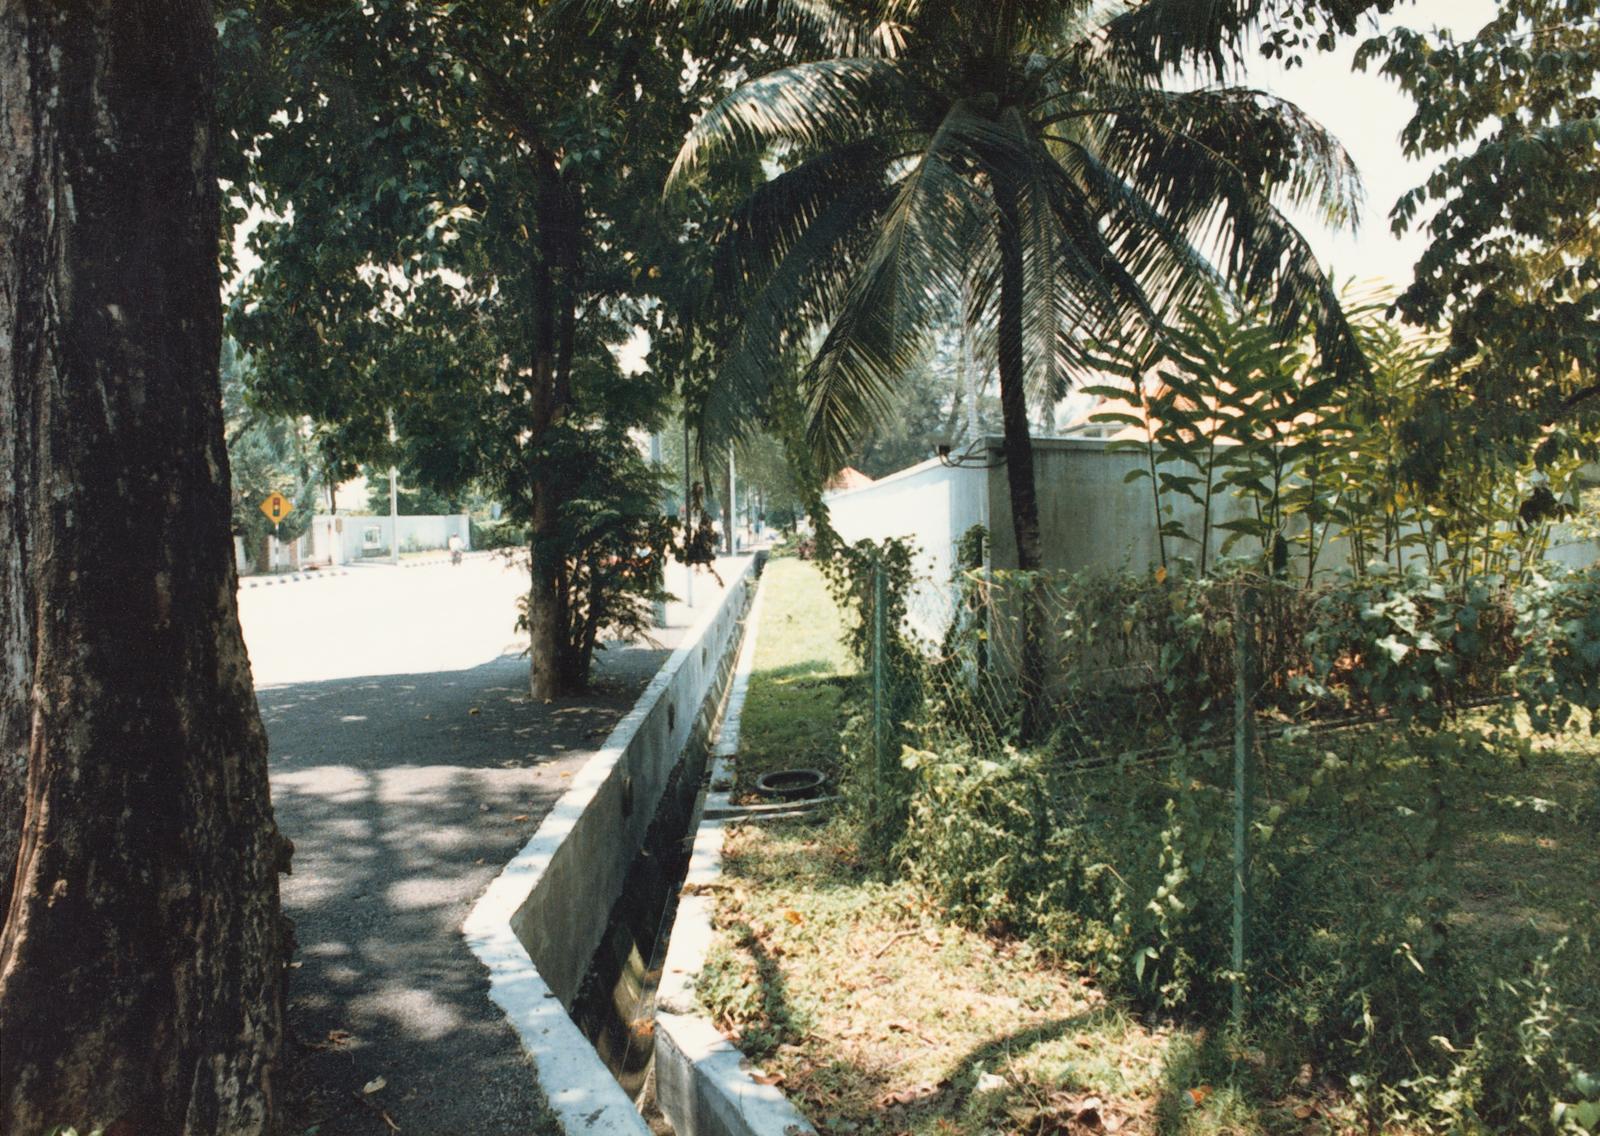 Kuala Lumpur - Recreation/Community Center/Gym/Theater - 1987